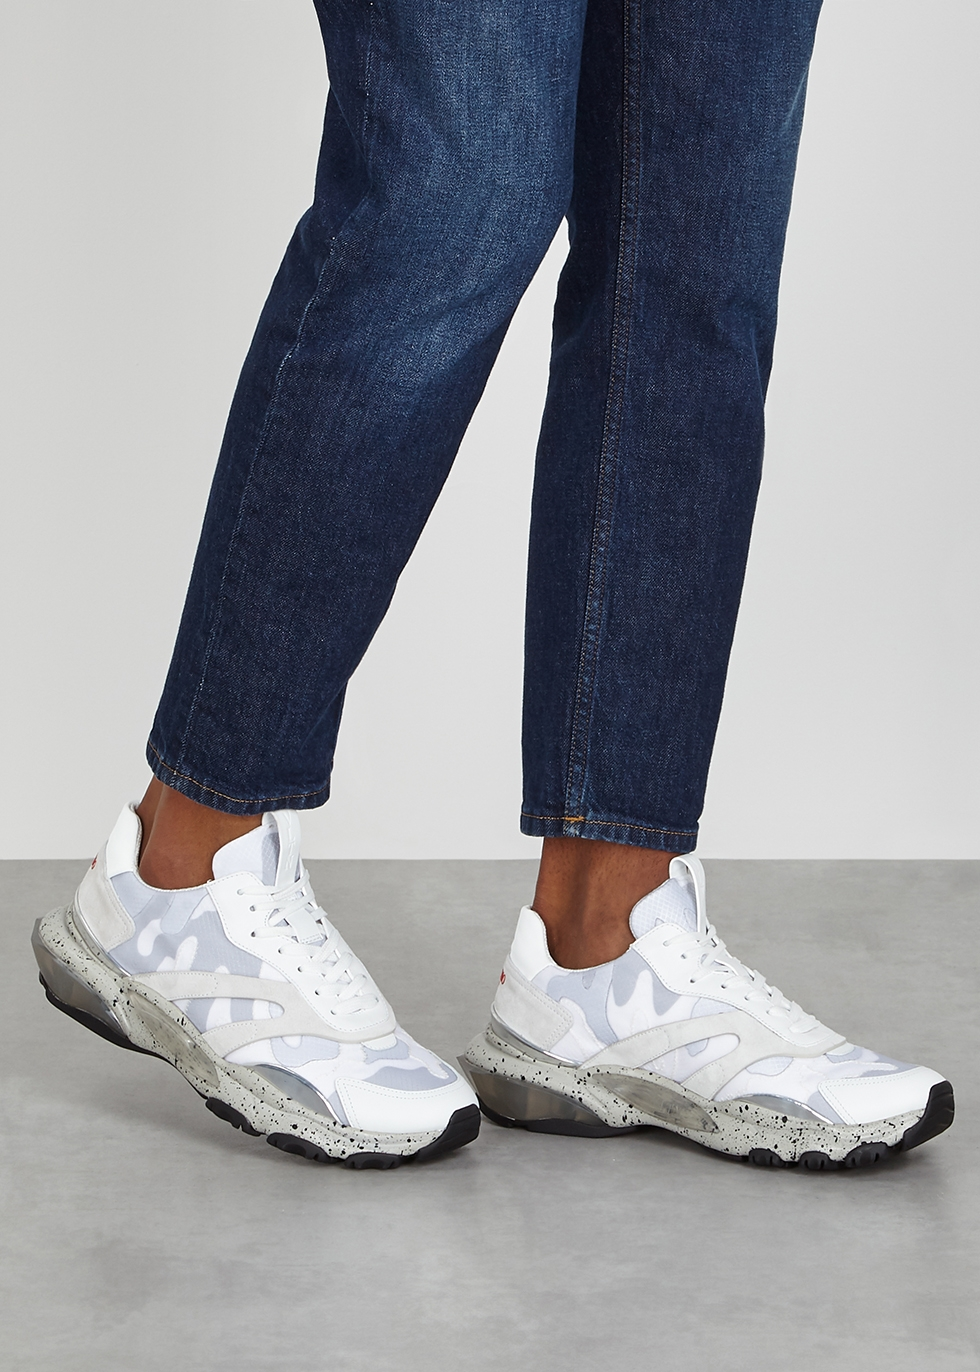 0a37ed23 Men's Designer Trainers, Sneakers & Sports Shoes - Harvey Nichols